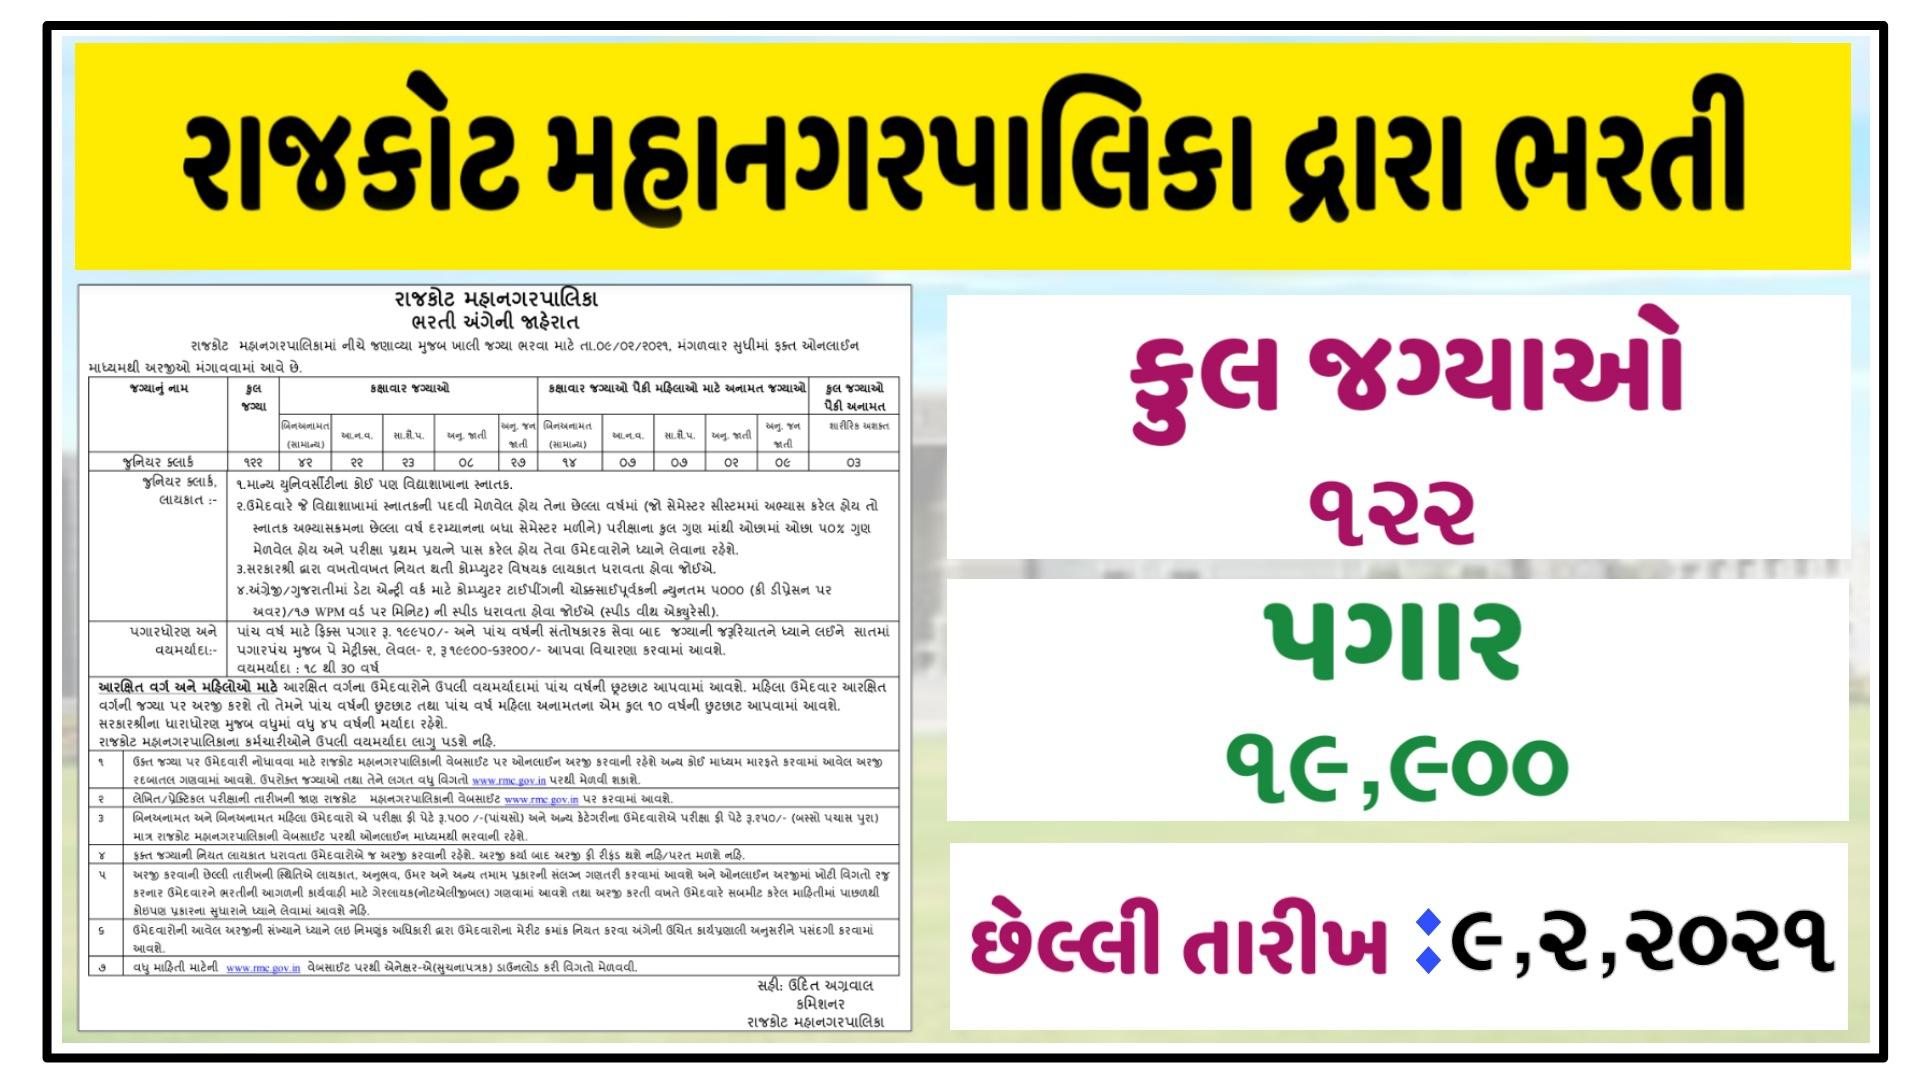 Rajkot Municipal Corporation Recruitment Notification For Junior Clerk Post Apply Online 2021